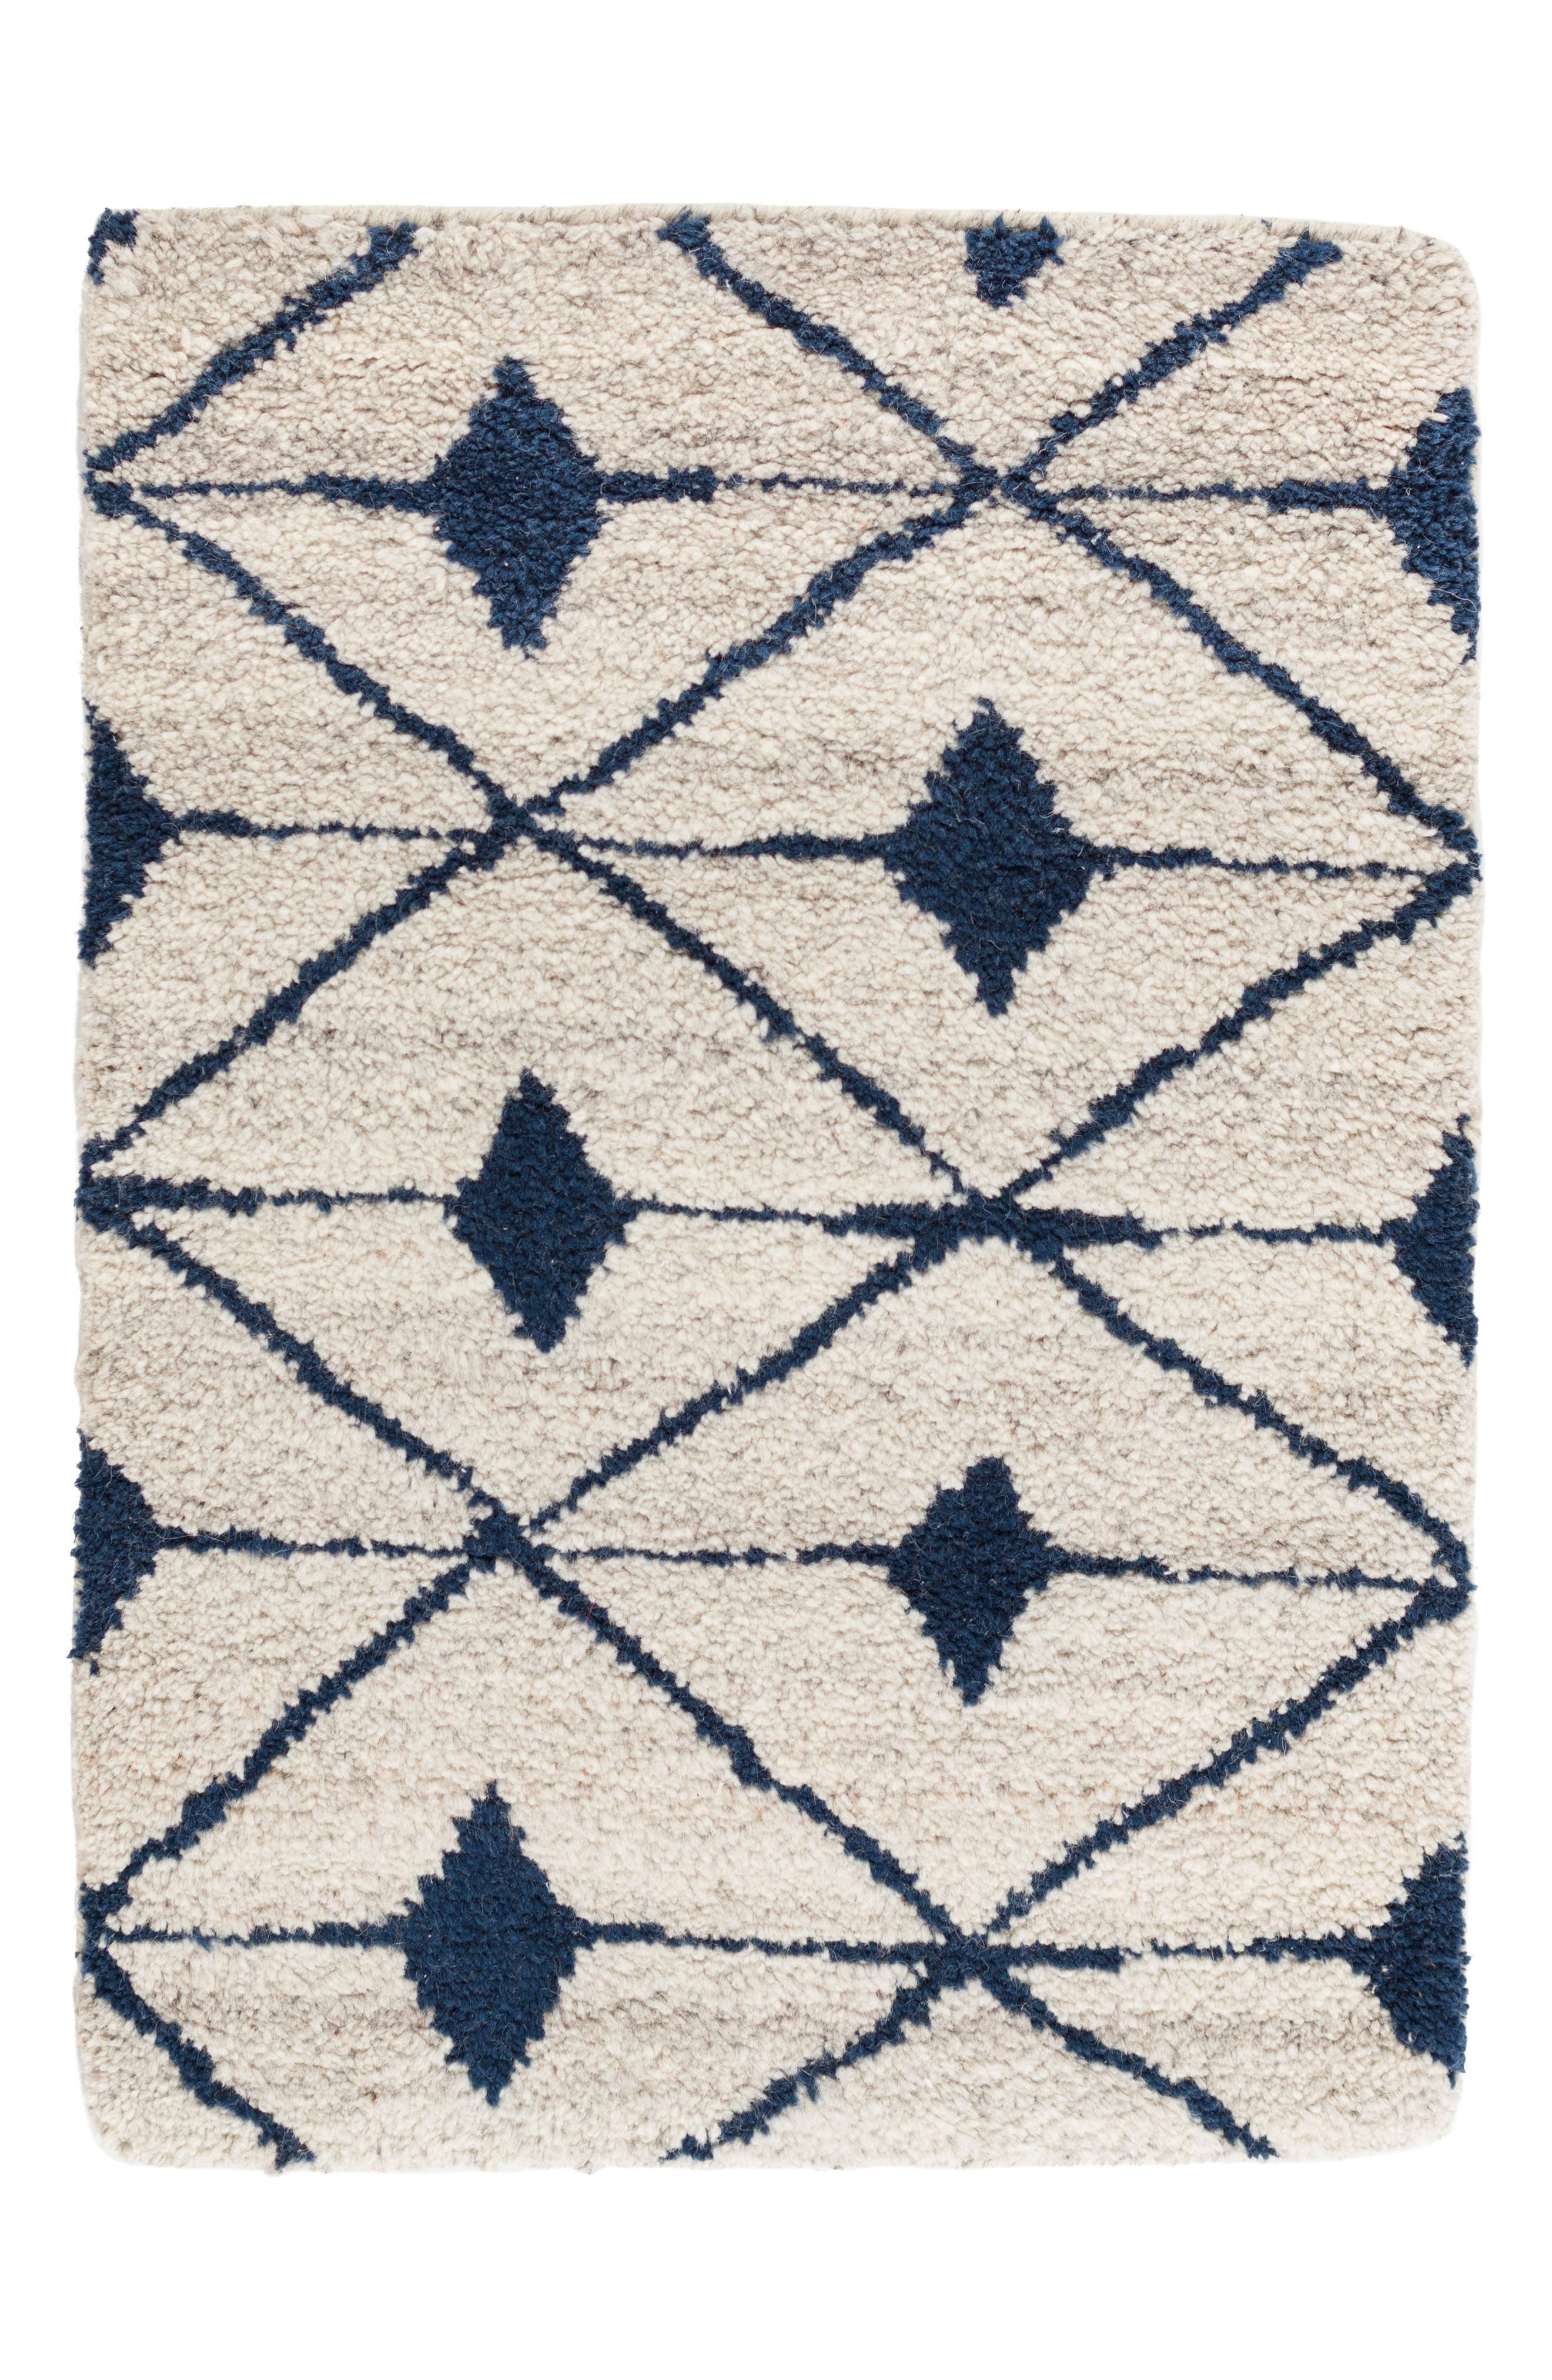 Kenitra Hand Knotted Rug,                         Main,                         color, INDIGO